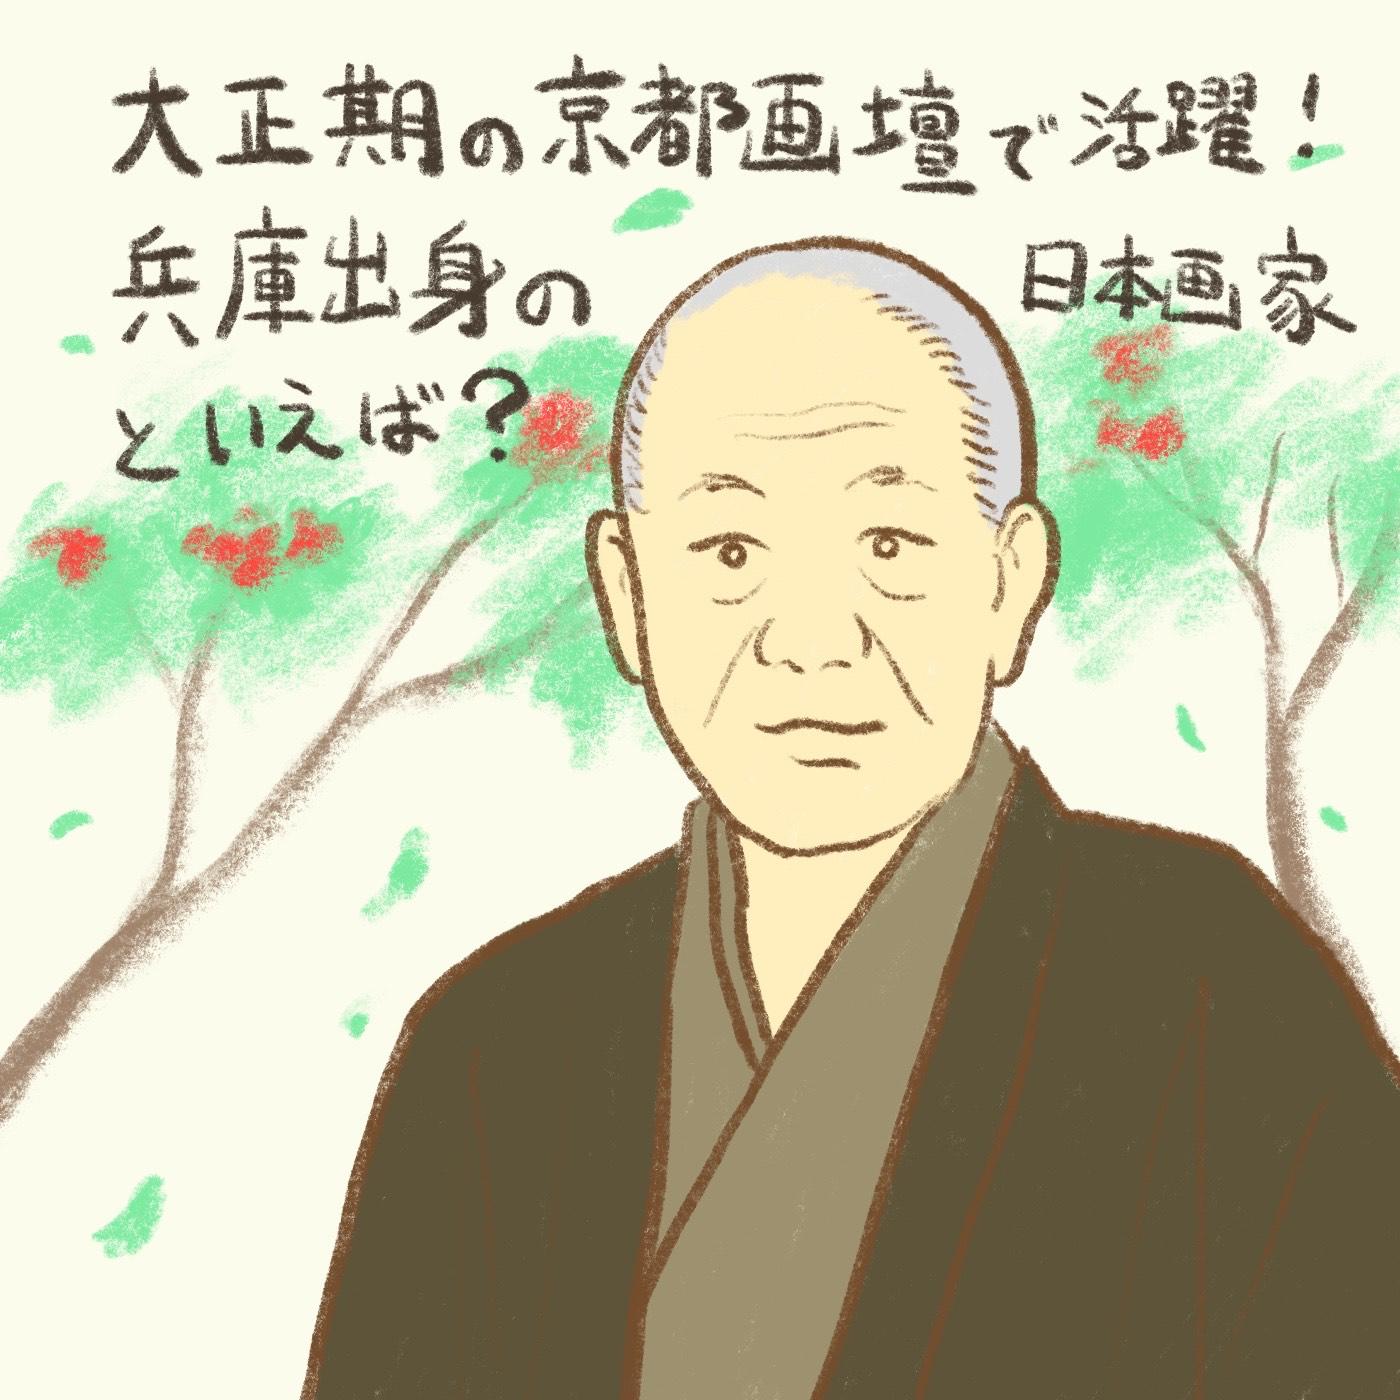 橋本関雪 京都画壇 OBIKAKE ナニソレ 姫路市立美術館